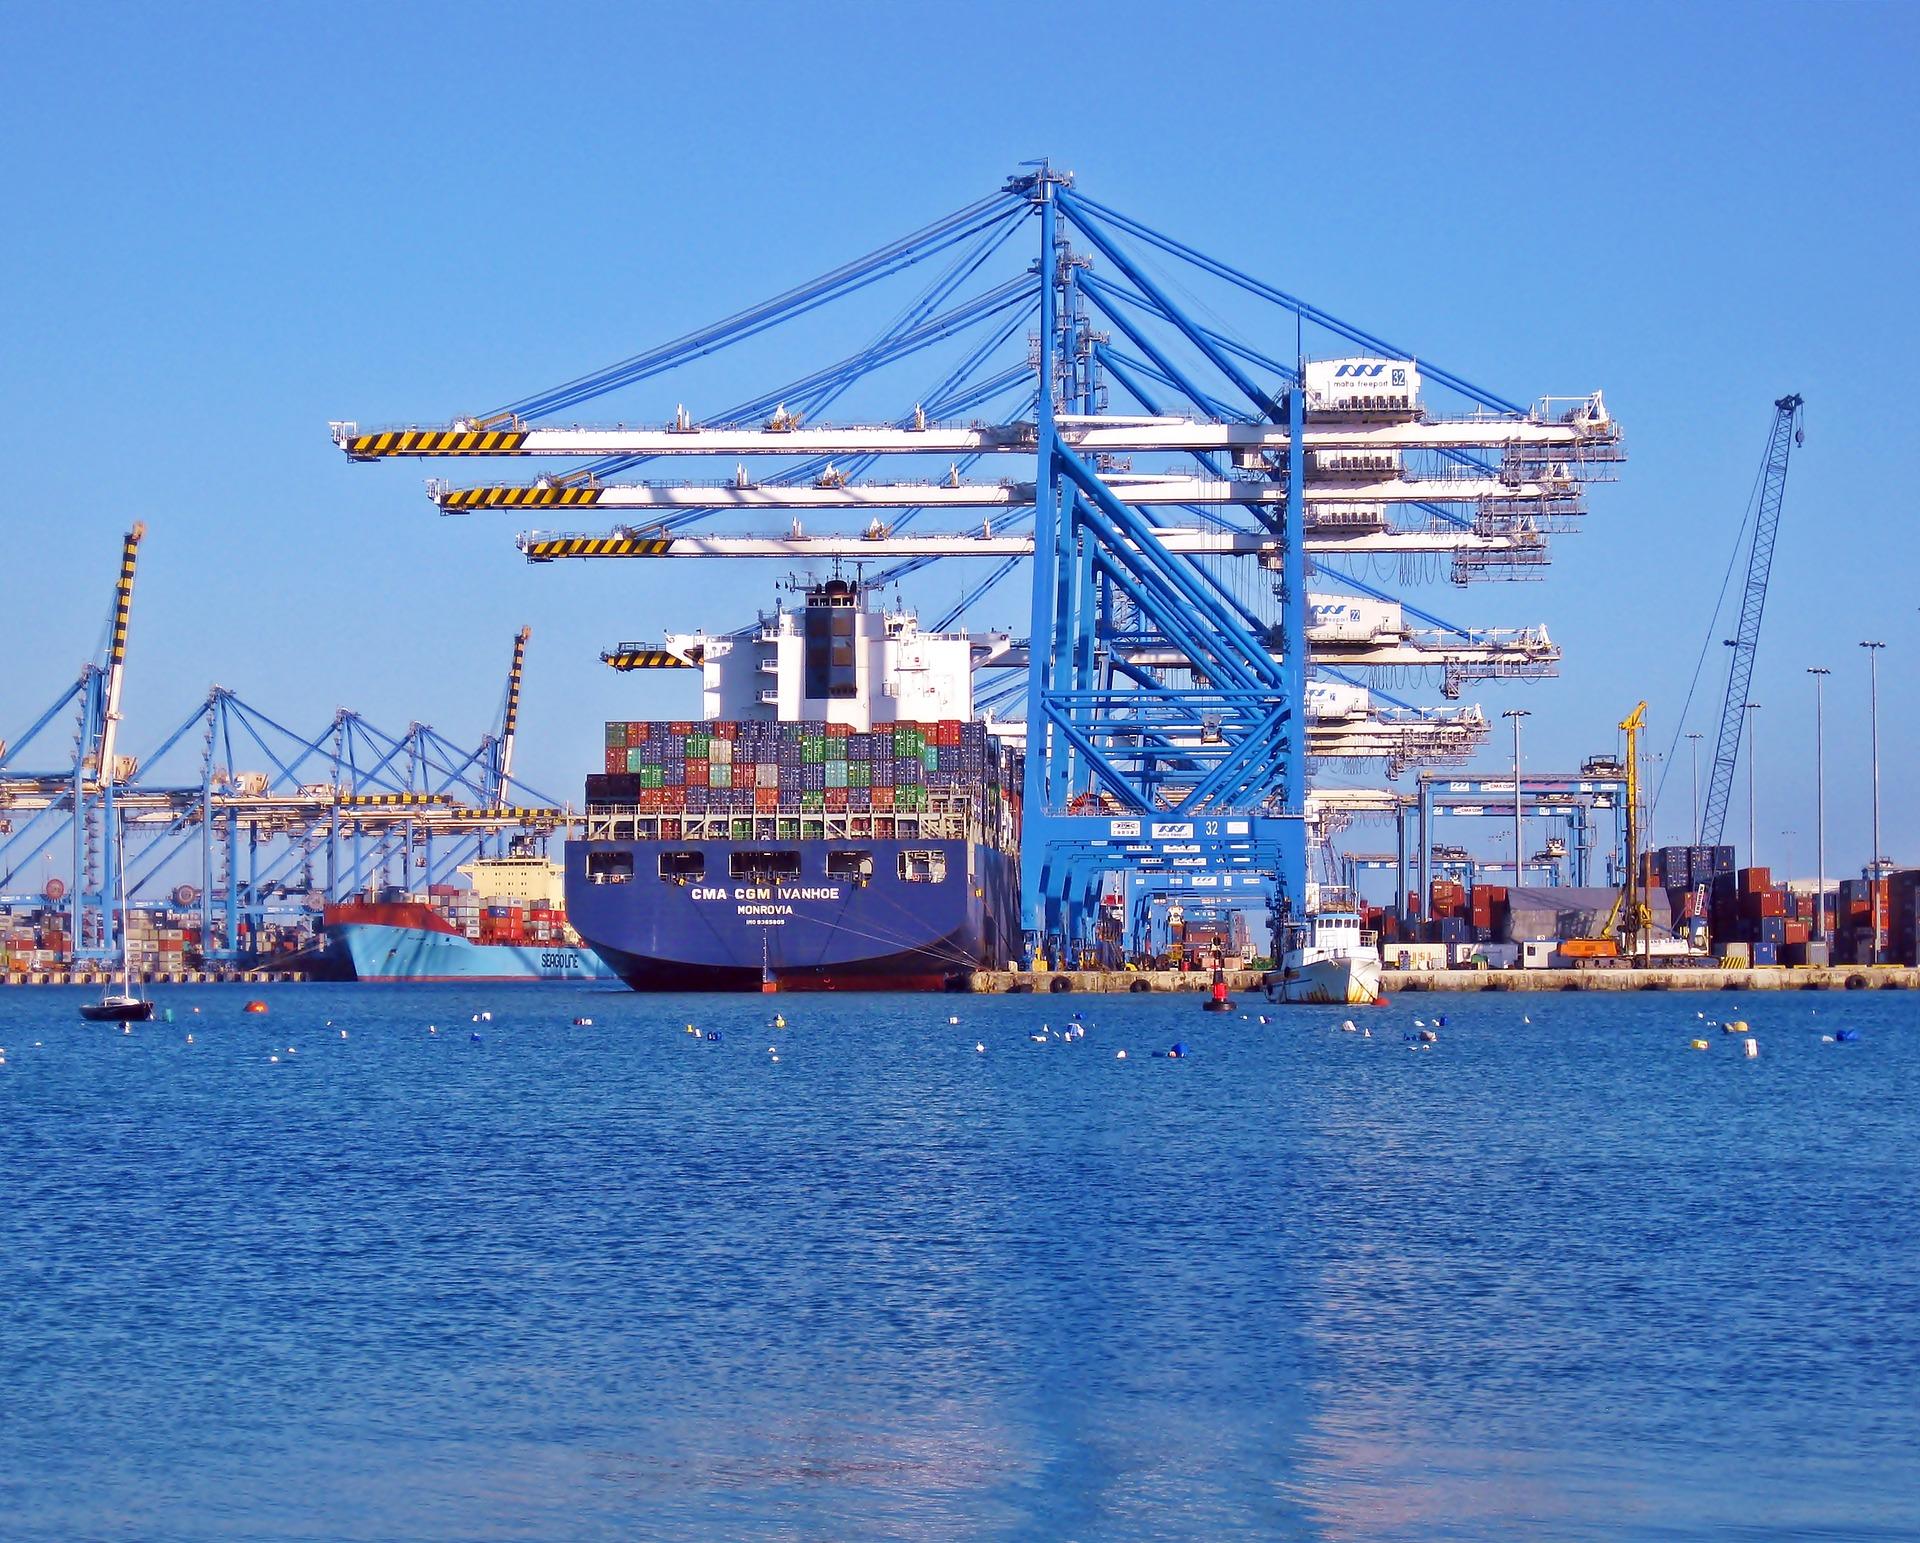 Jasa Pengiriman Kendaraan dan Cargo